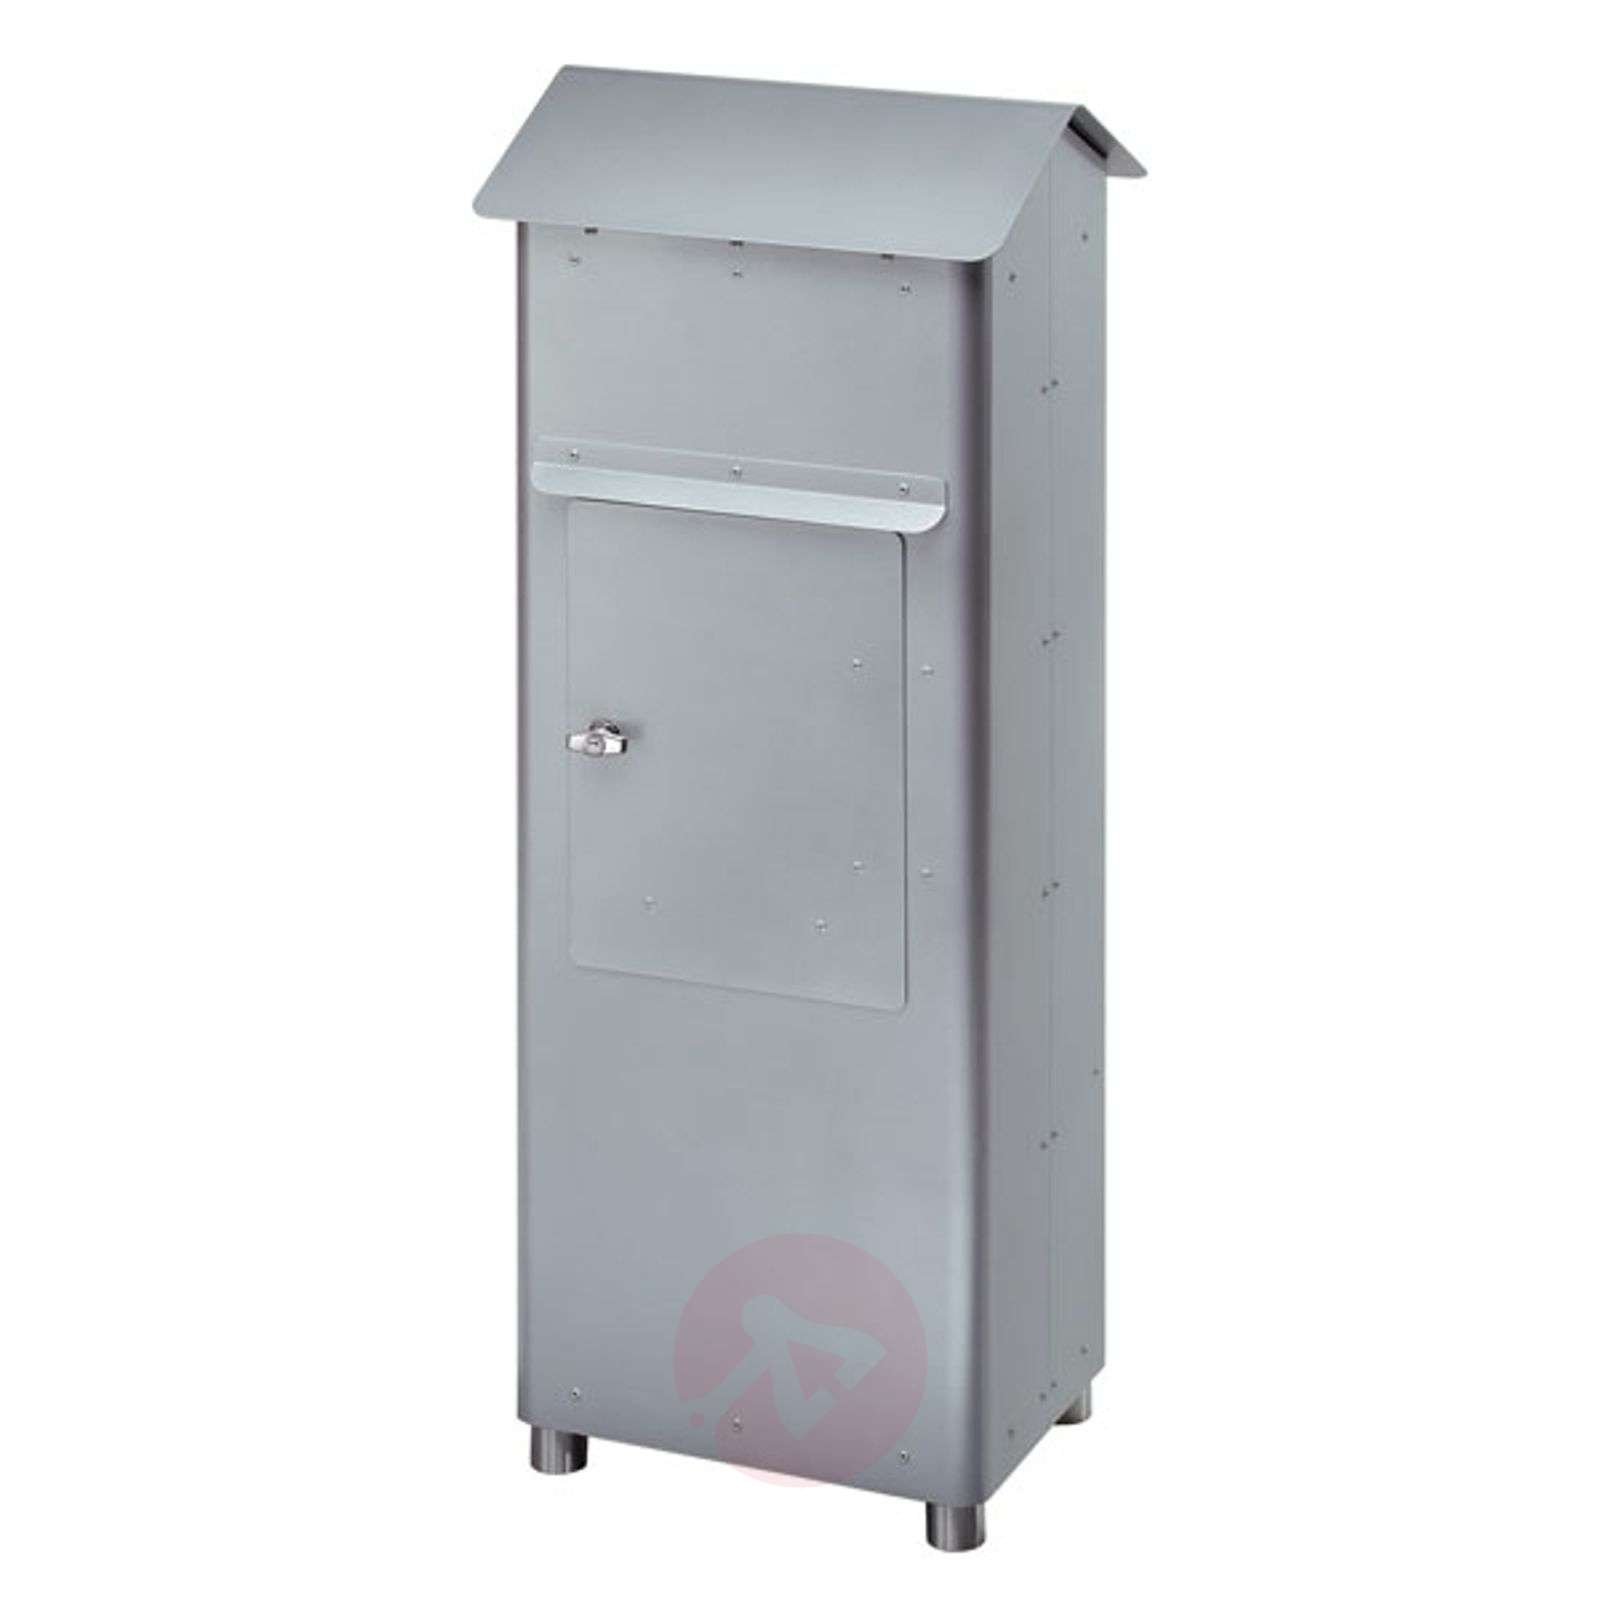 Letterbox GRANDE SECURI 2-4502056X-01